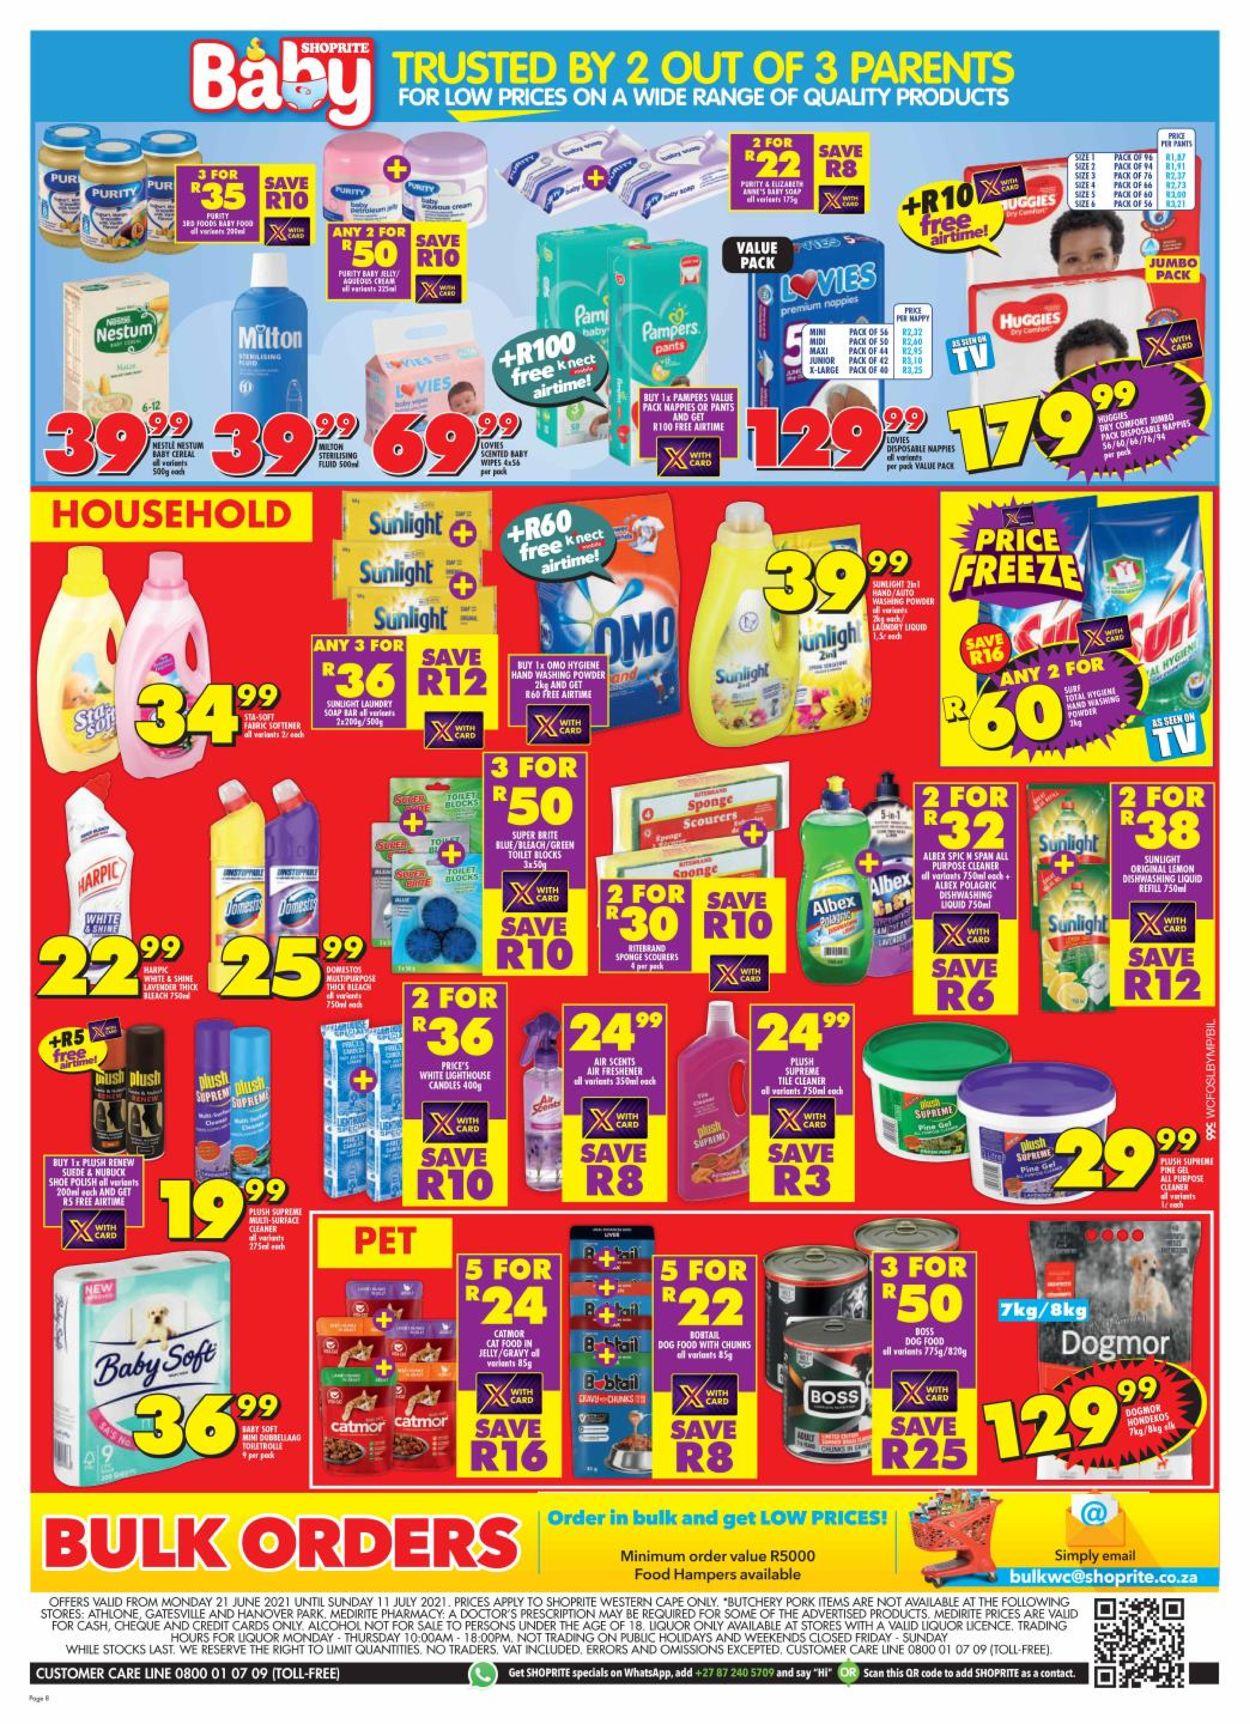 Shoprite Catalogue - 2021/06/21-2021/07/11 (Page 7)